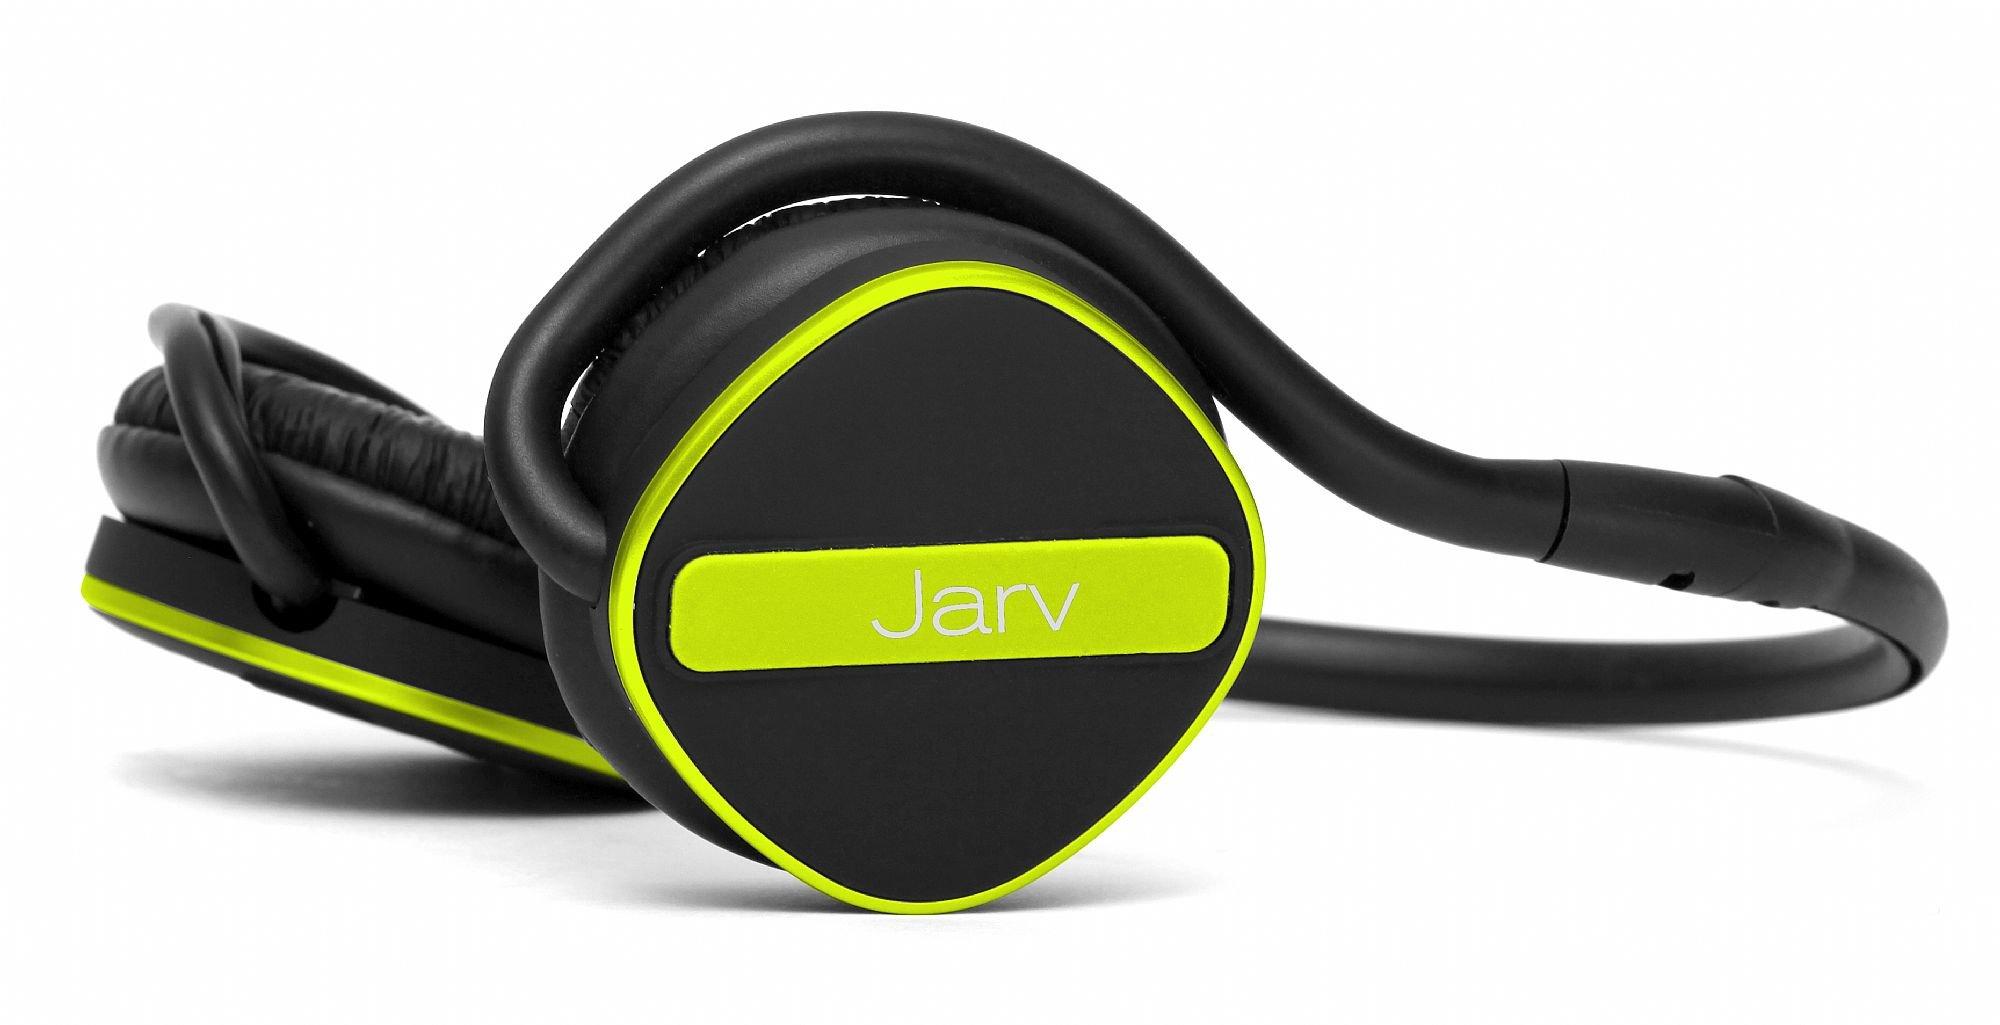 Auriculares Jarv Joggerz Pro Sports Inalambrico Con Microfono Incorporadorofono Plegable Design Y Universal Fit - 20 Hor